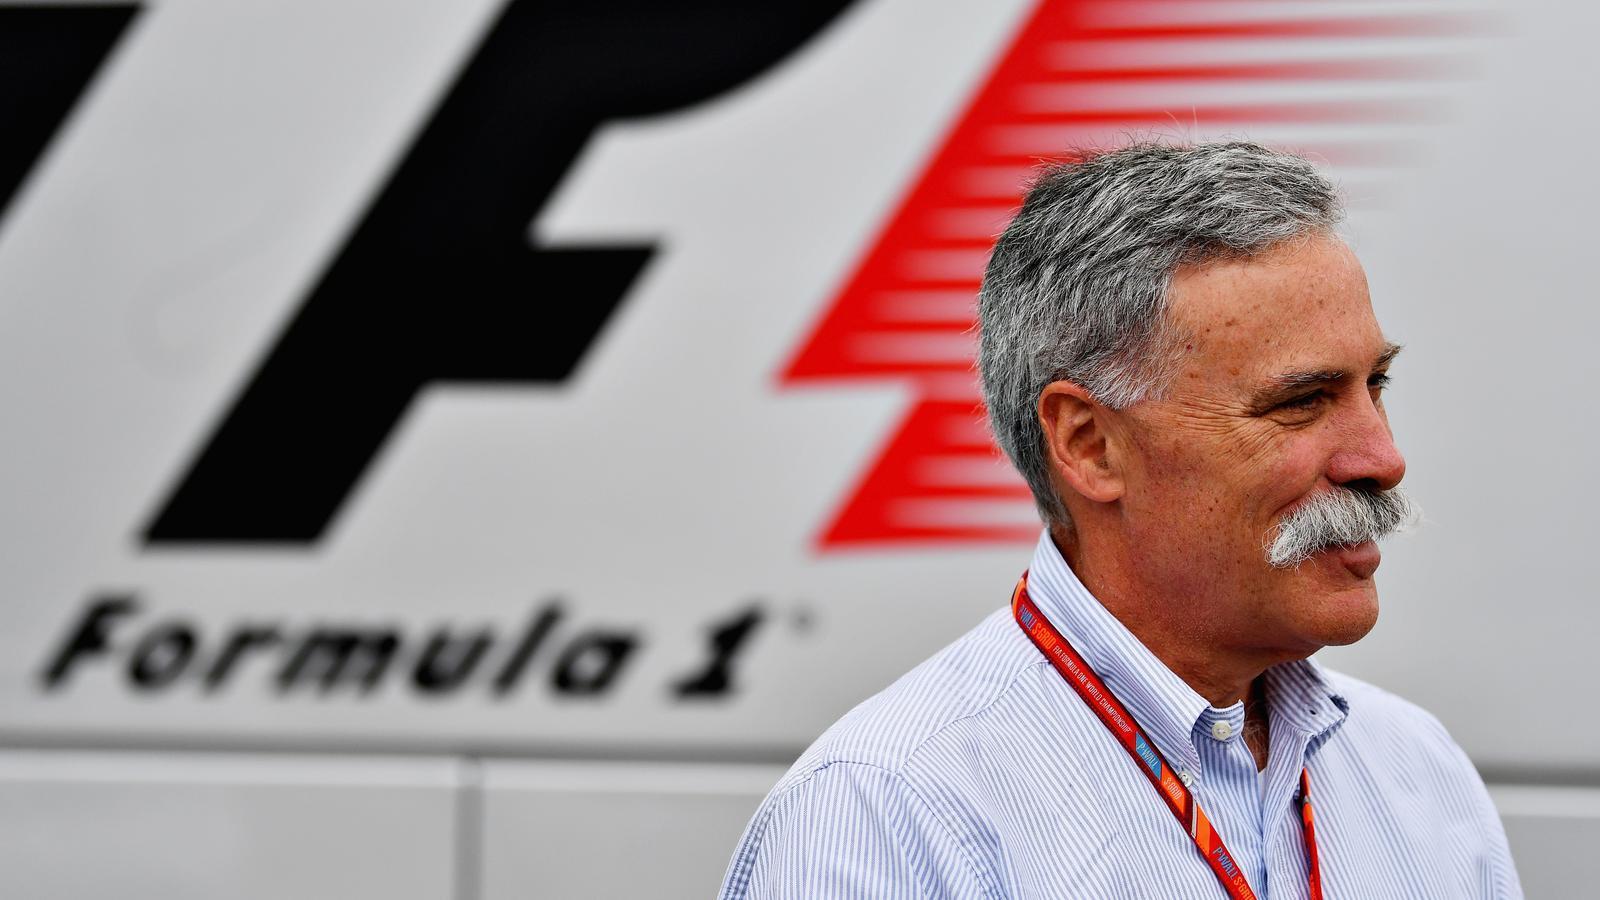 Chase Carey és el president i conseller delegat de Formula One Group.